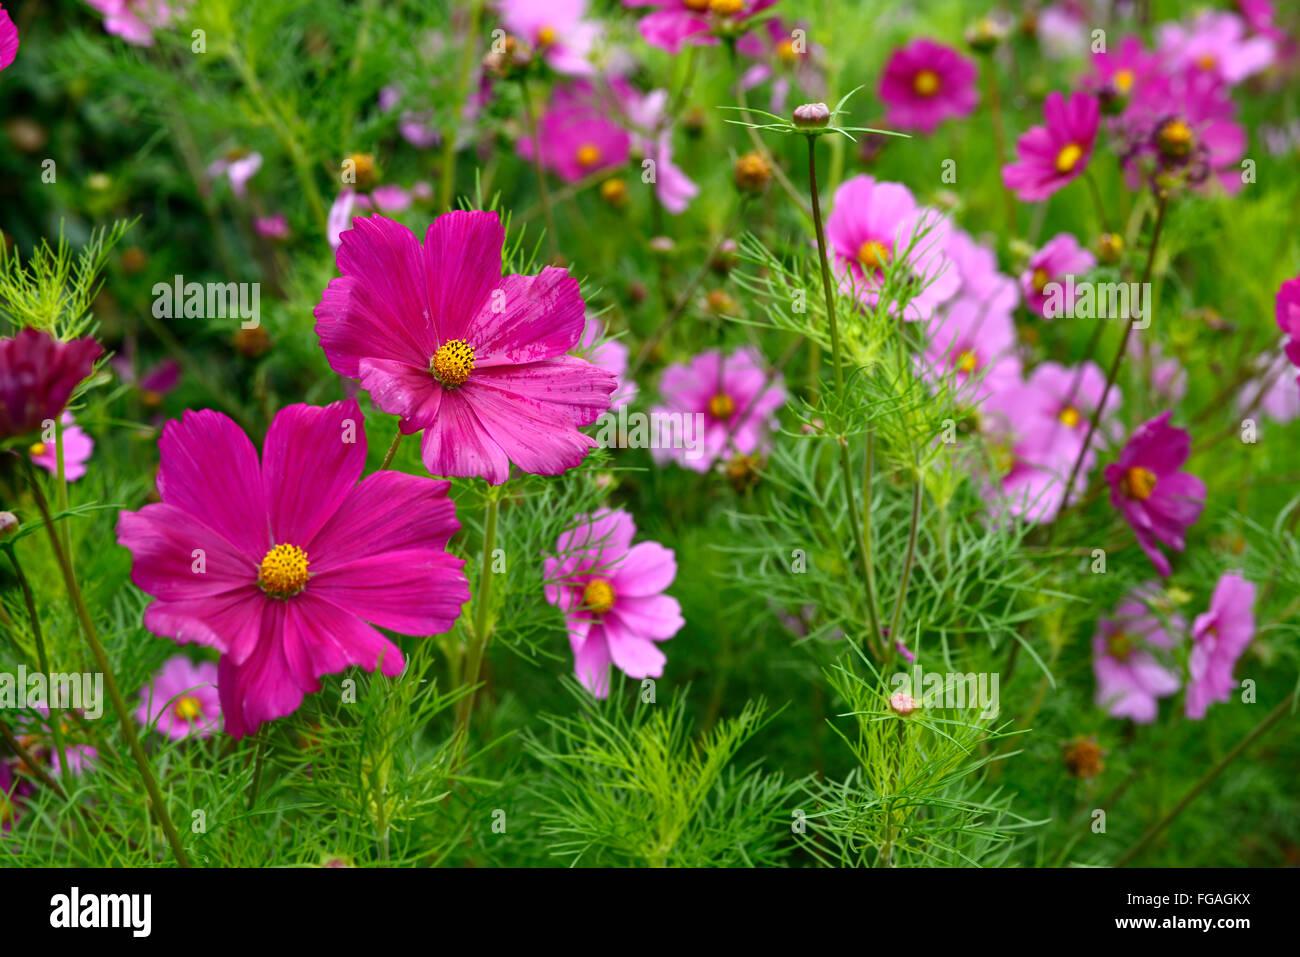 Sensazione di cosmos mix rosa viola fiori annuali fiore fioritura